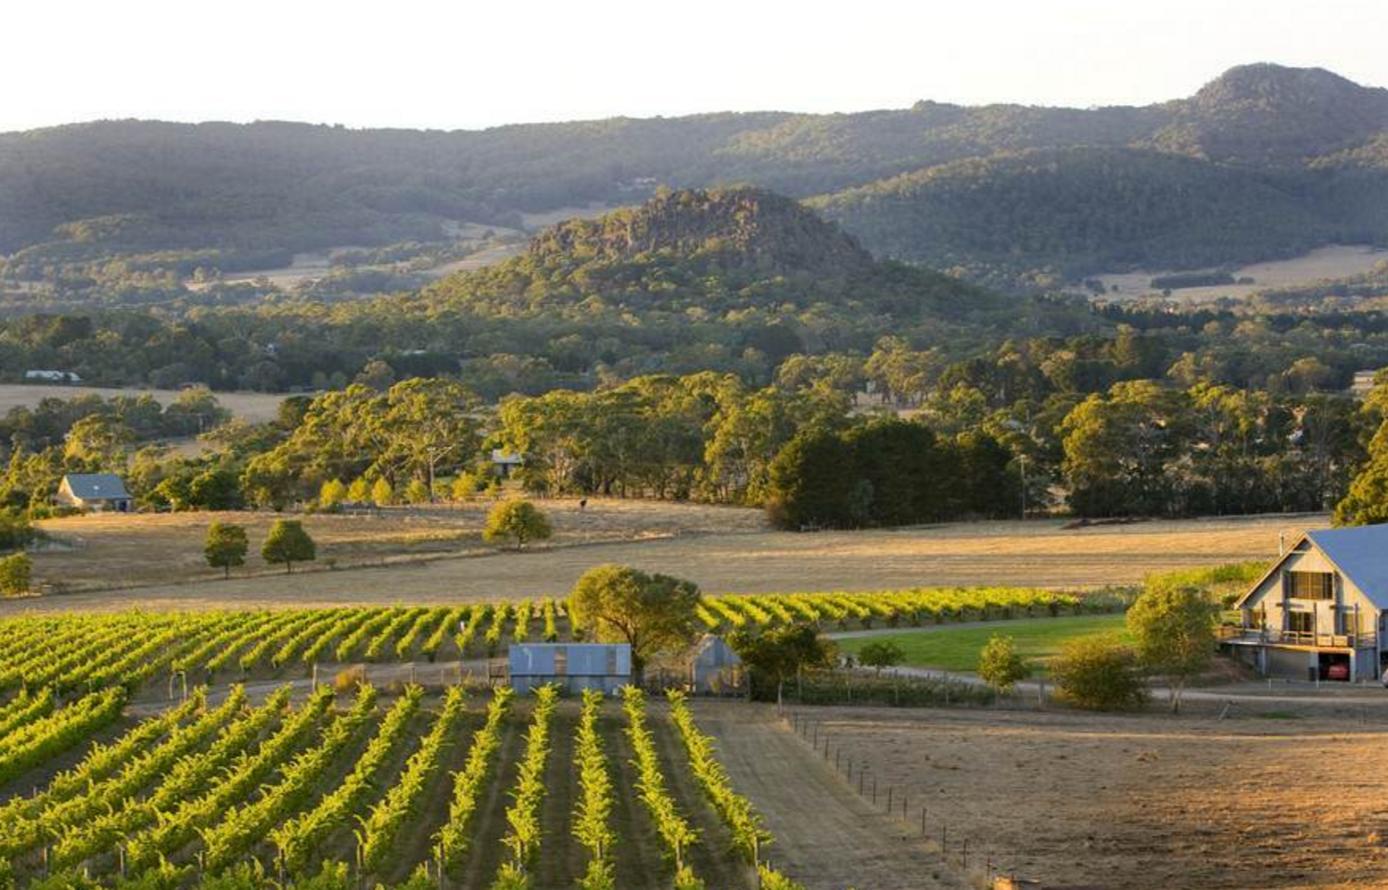 Macedon Ranges Winery